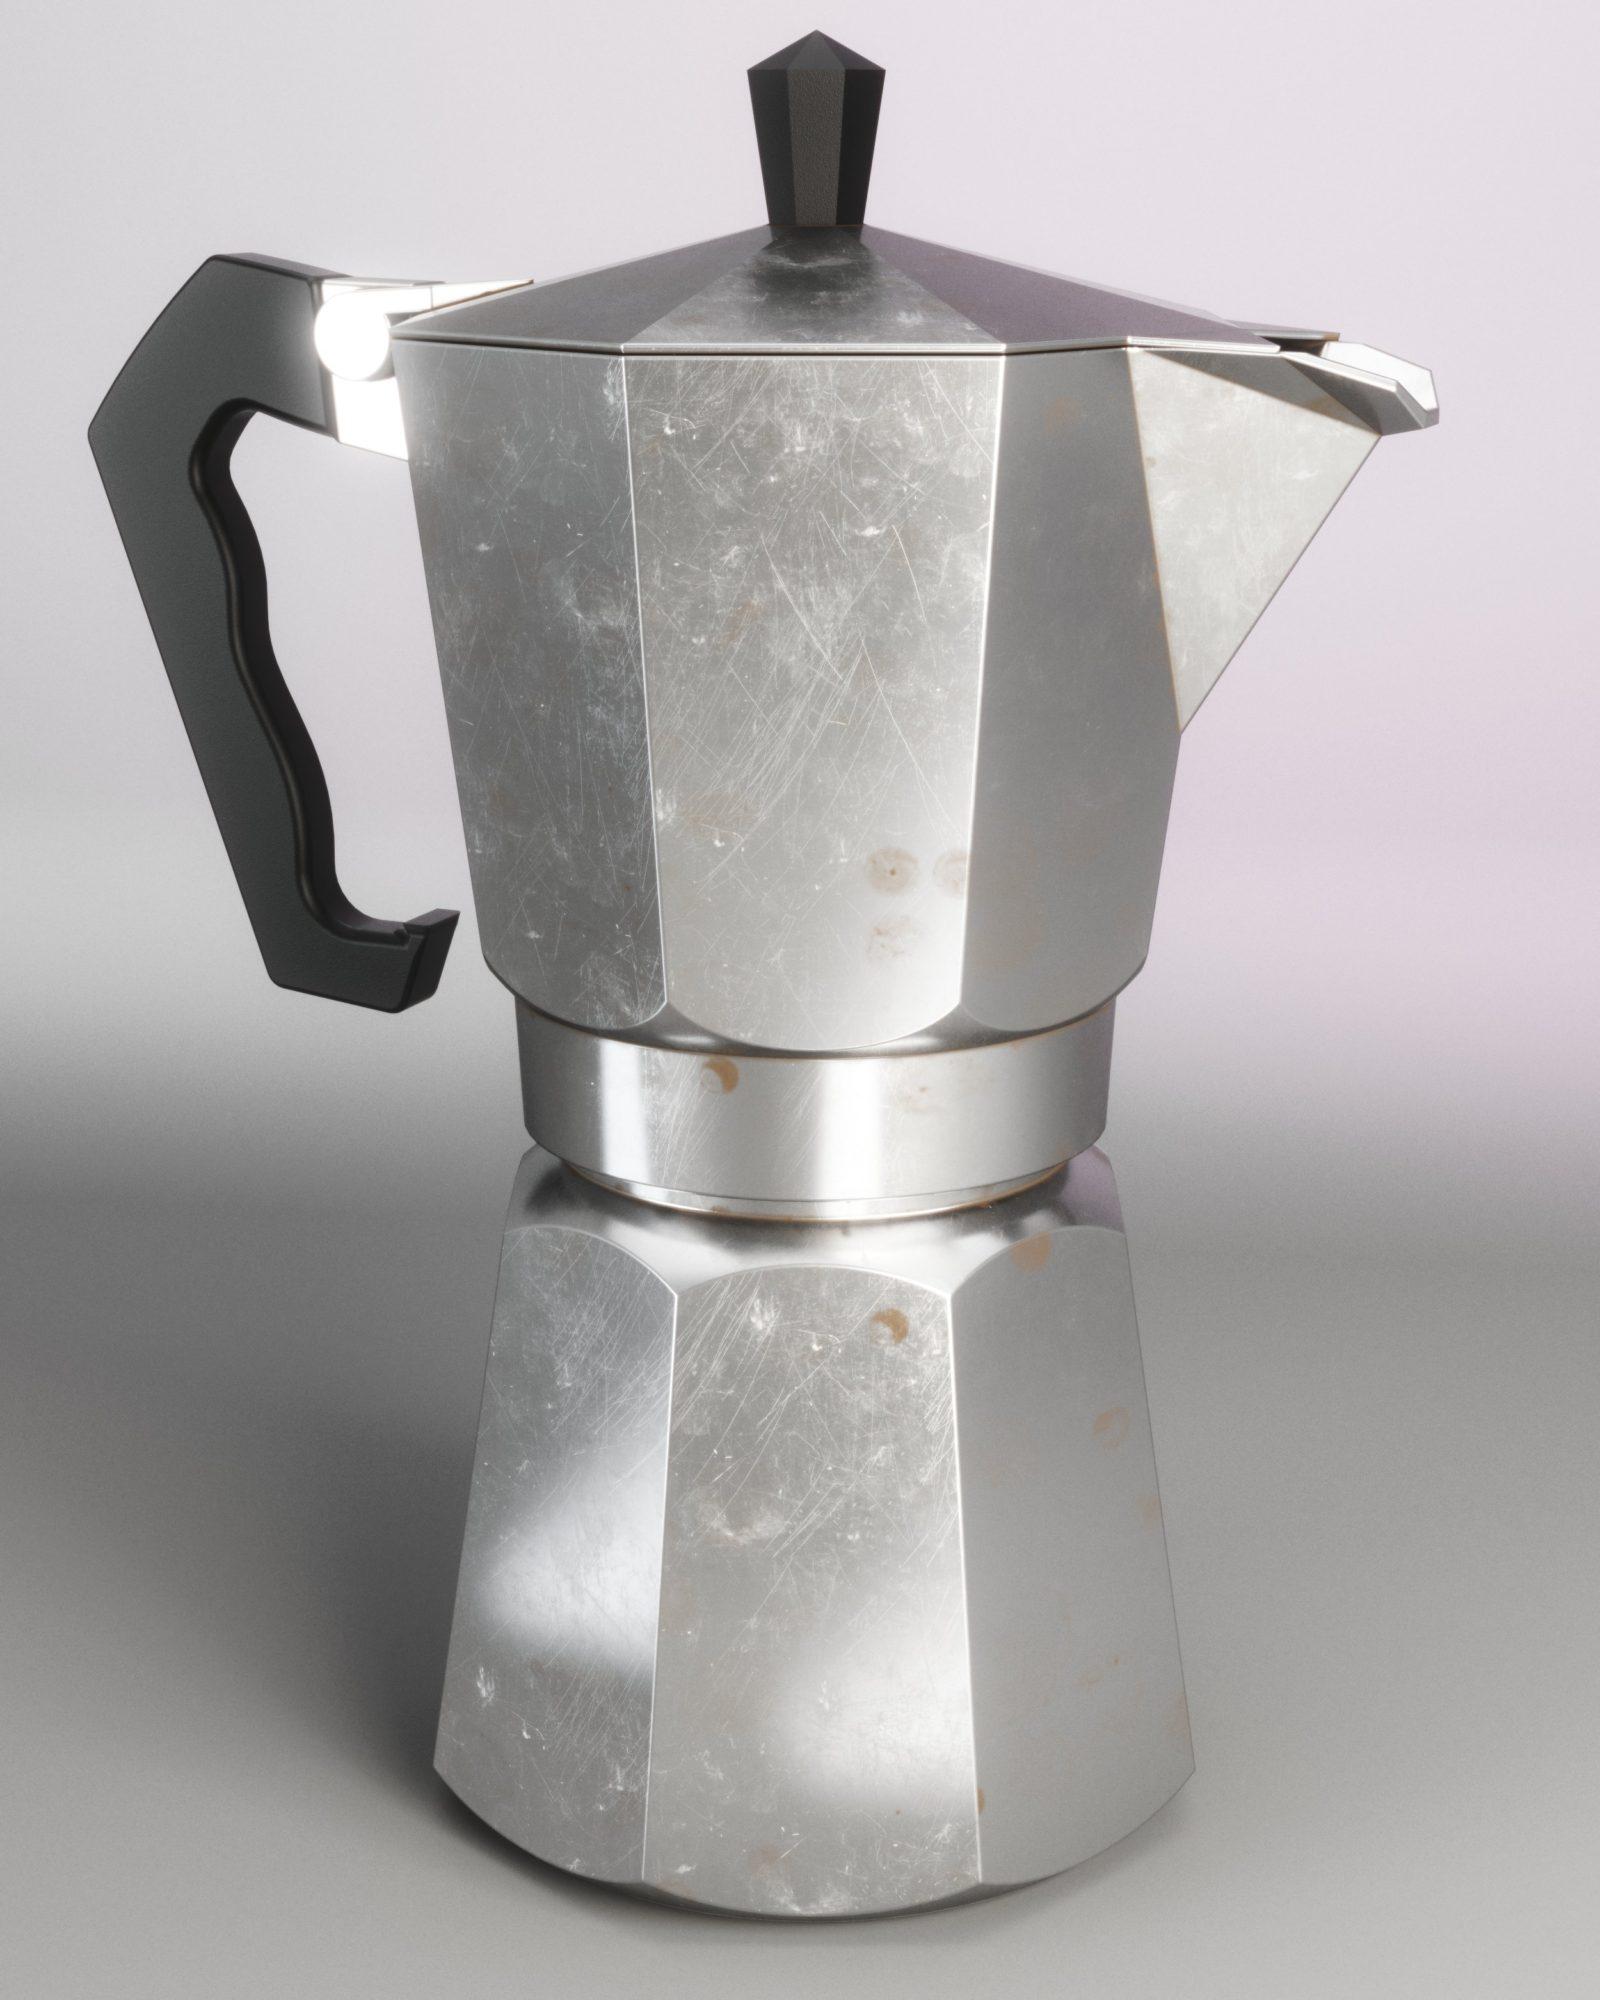 caffettiera.jpg